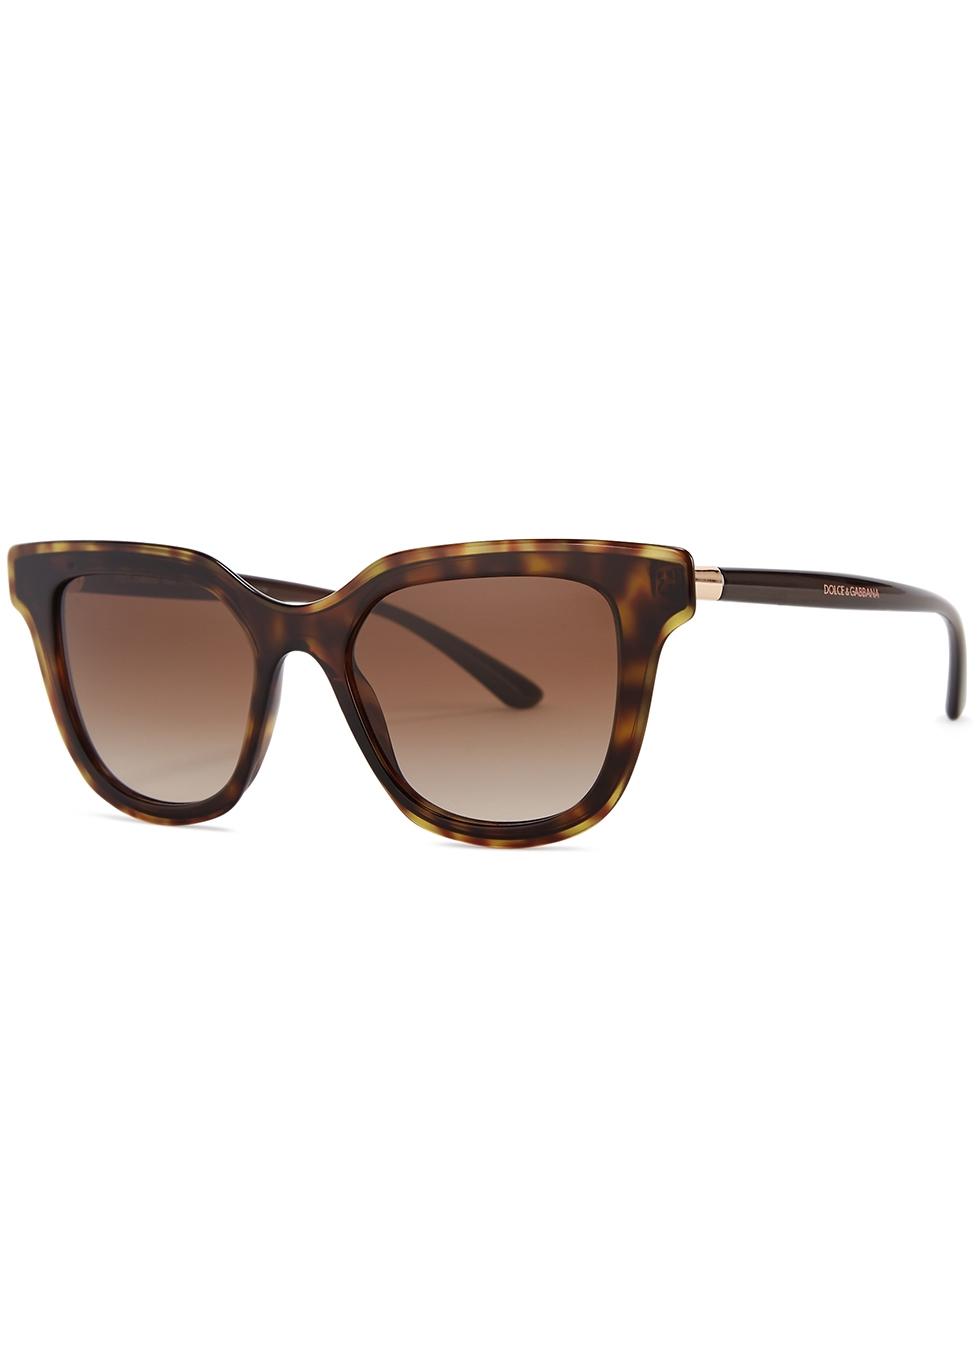 Tortoiseshell wayfarer-style sunglasses - Dolce & Gabbana